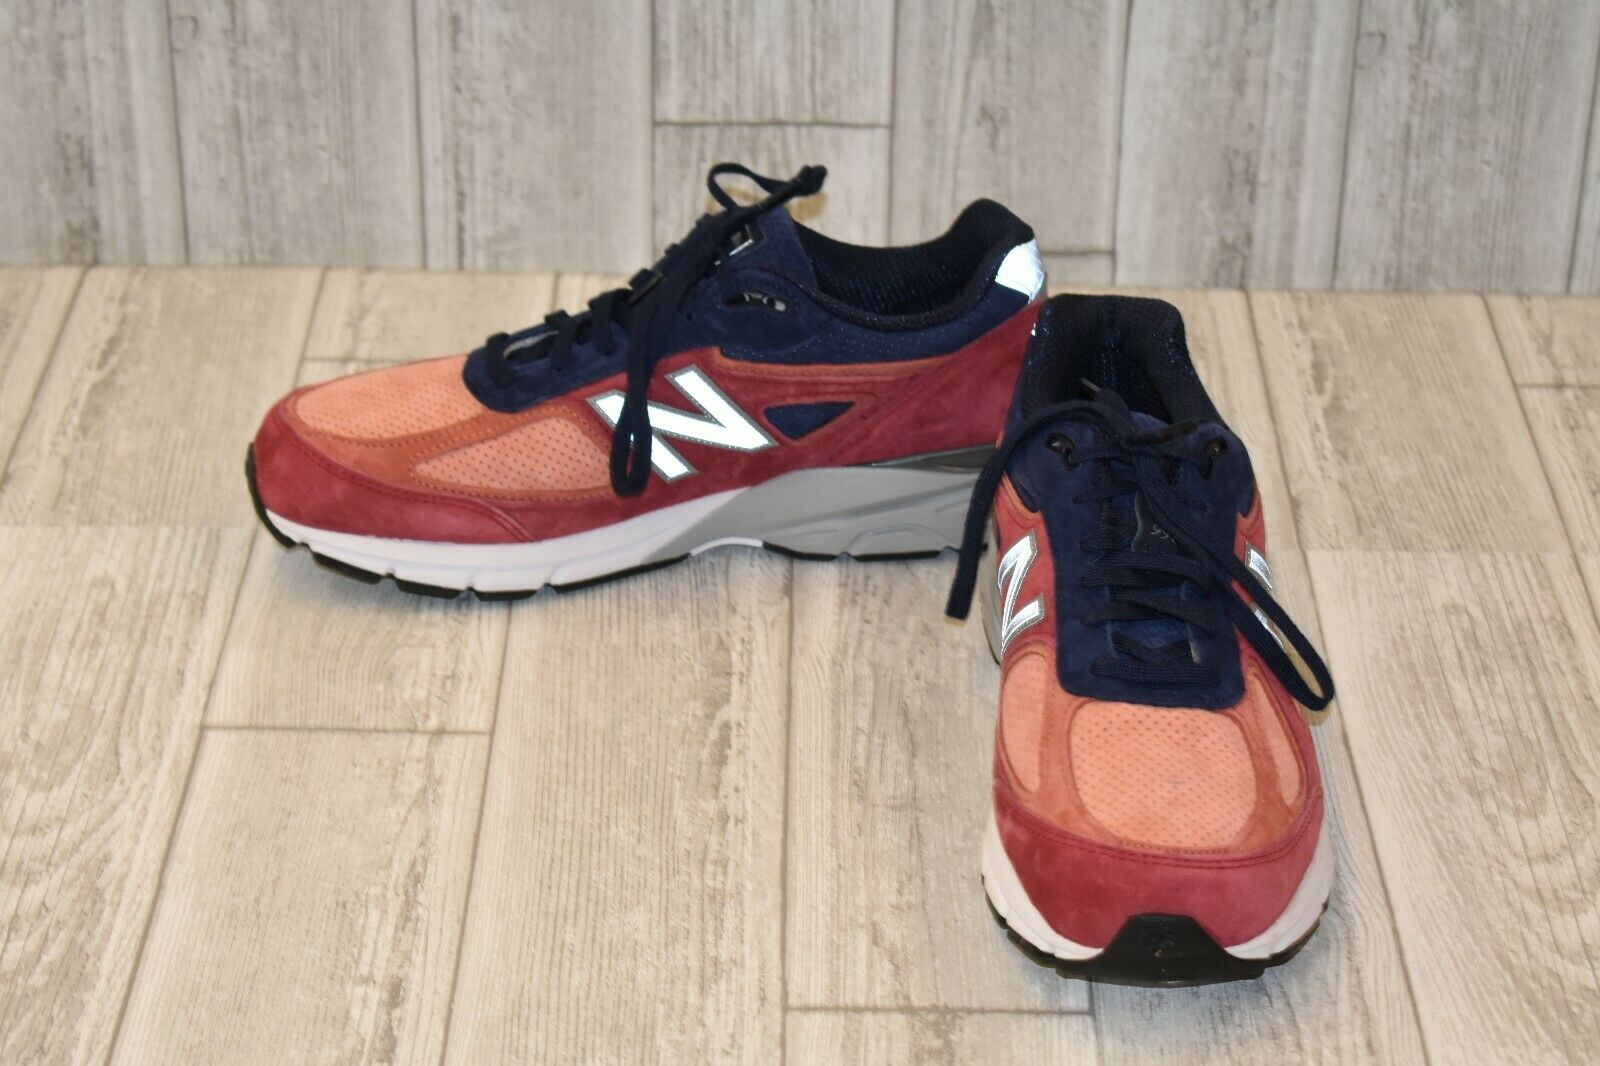 New Balance M990CP4 Running shoes - Men's Size 12.5D - - - pink Navy 584188